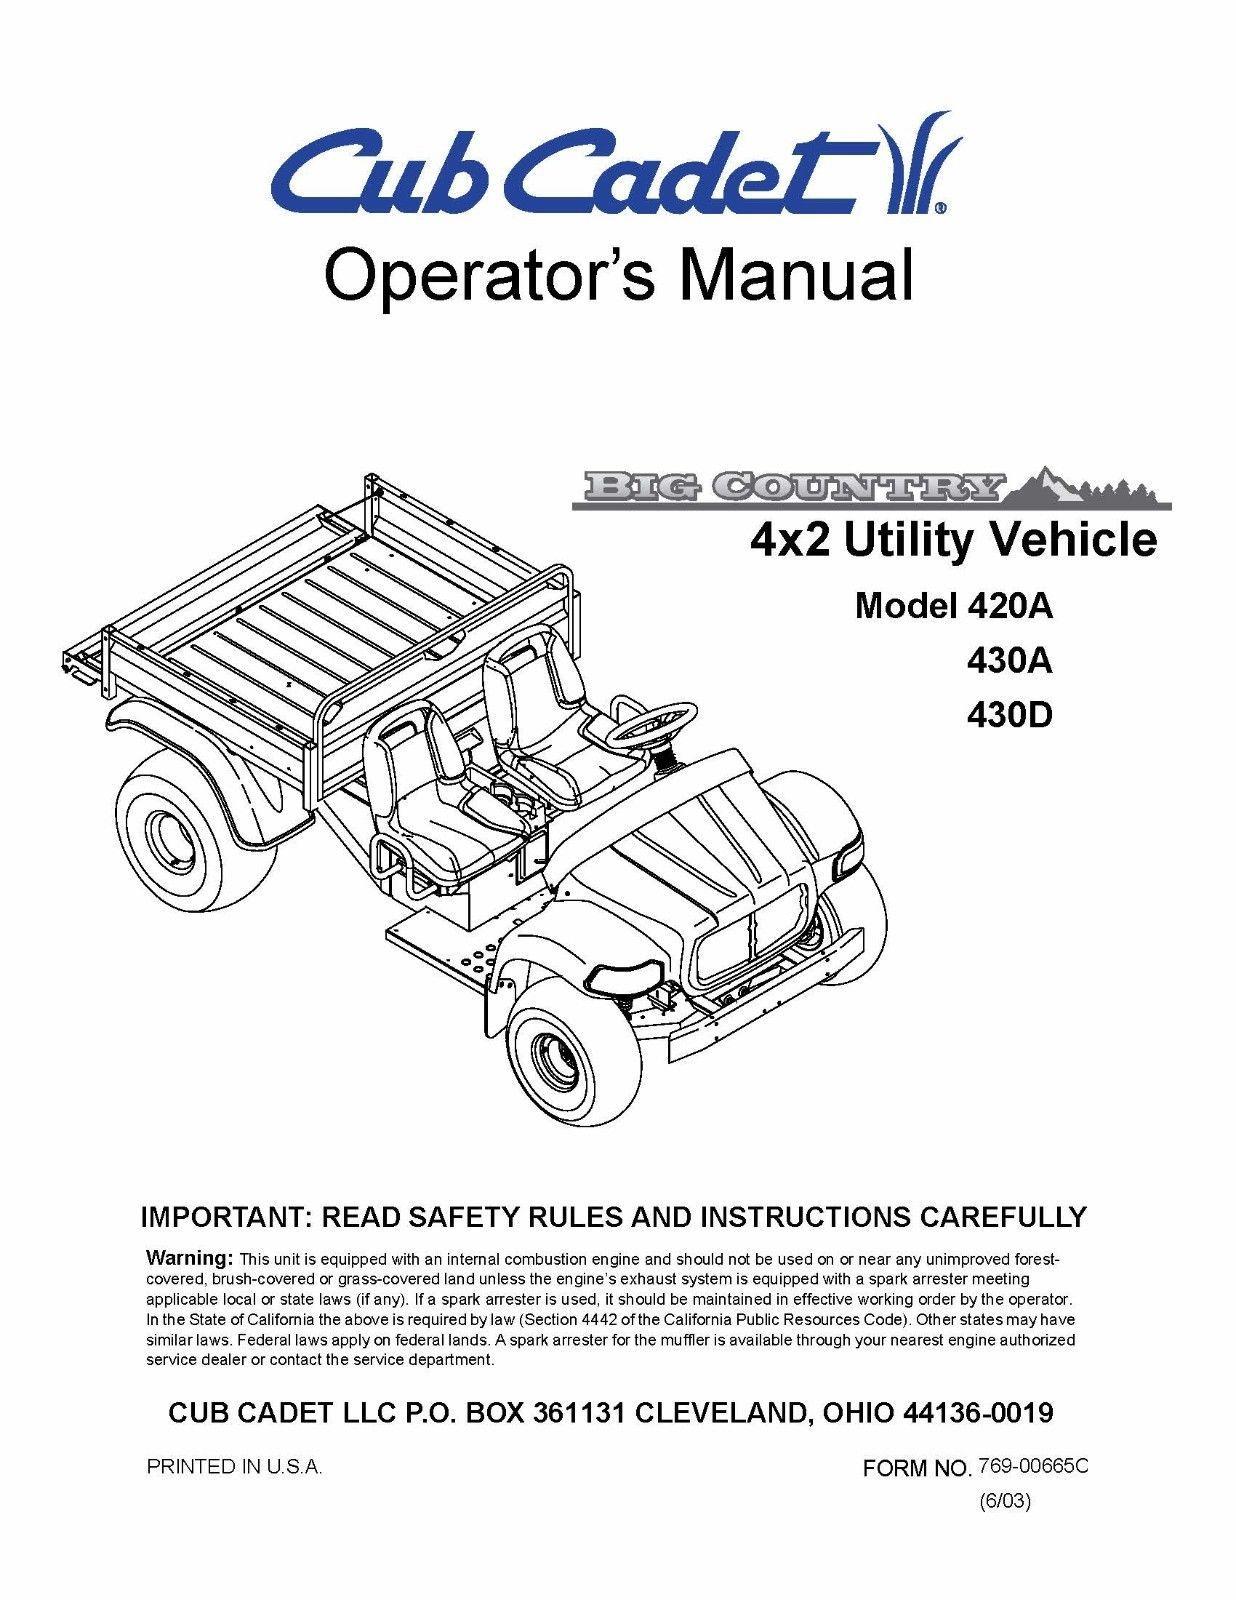 Cub Cadet Big Country 4x2 utility vehicle Operator's Manual No. 420A 430A 430D